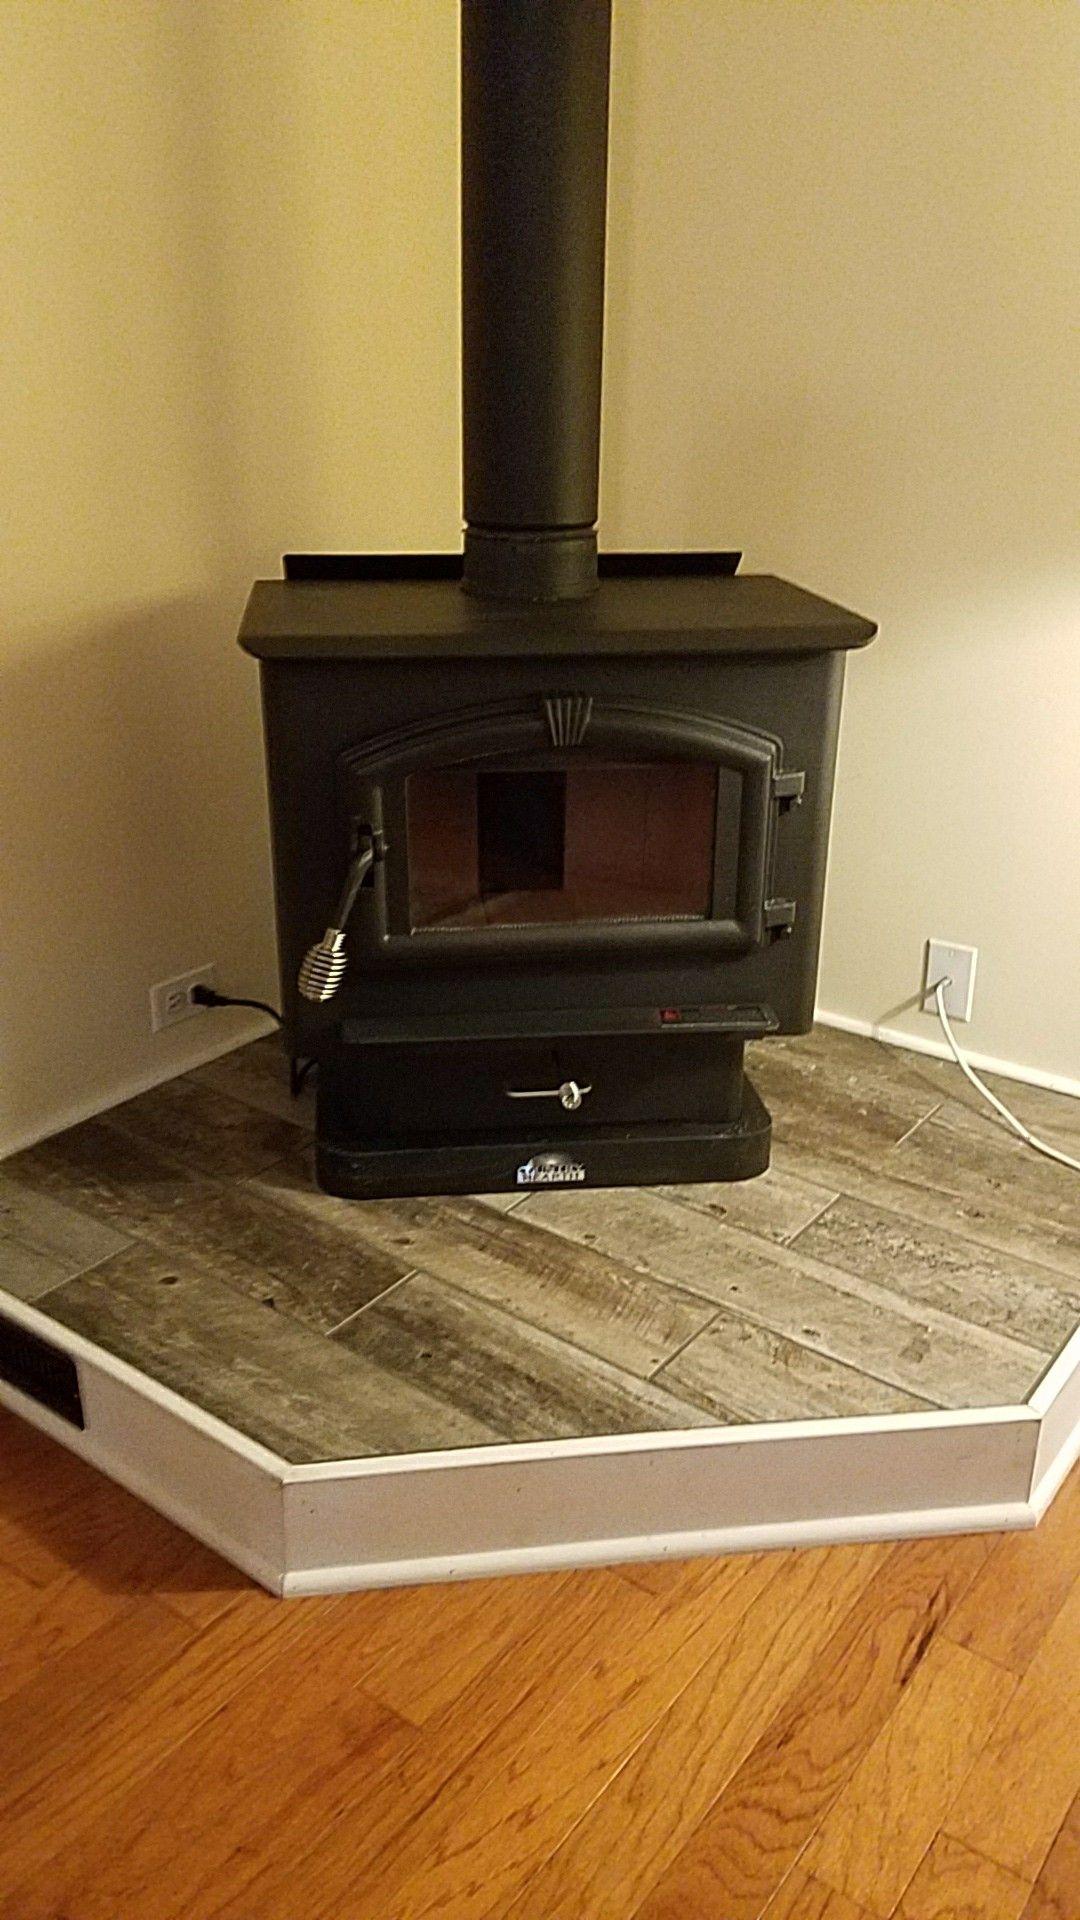 My Stove With Raised Wood Floor Pellet Stove Wood Heater Wood Stove Surround